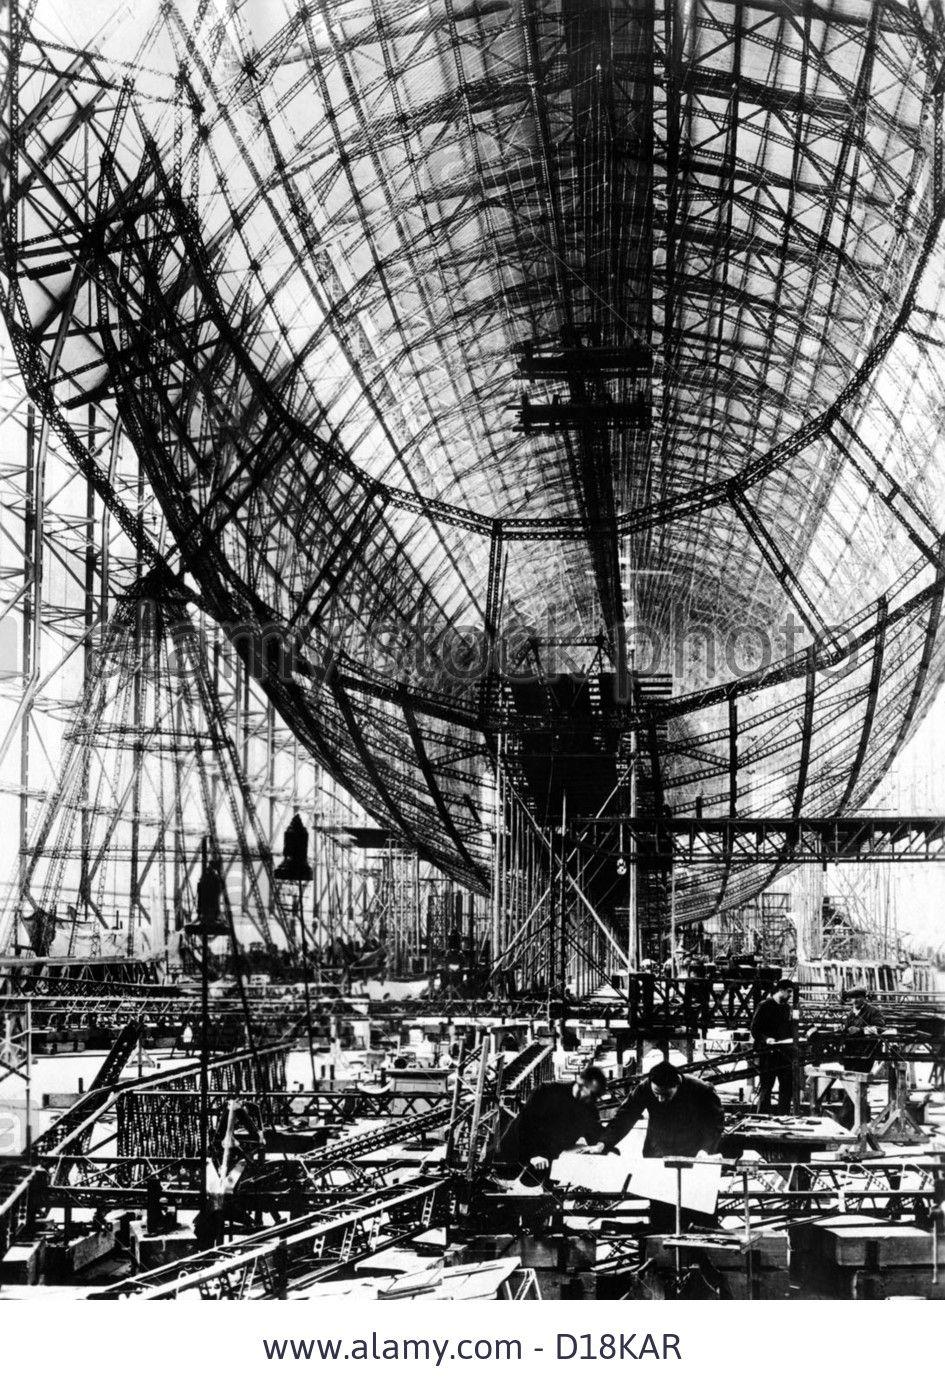 hindenburg-airship-under-construction-the-almost-complete-steel-frame-D18KAR.jpg (945×1390)